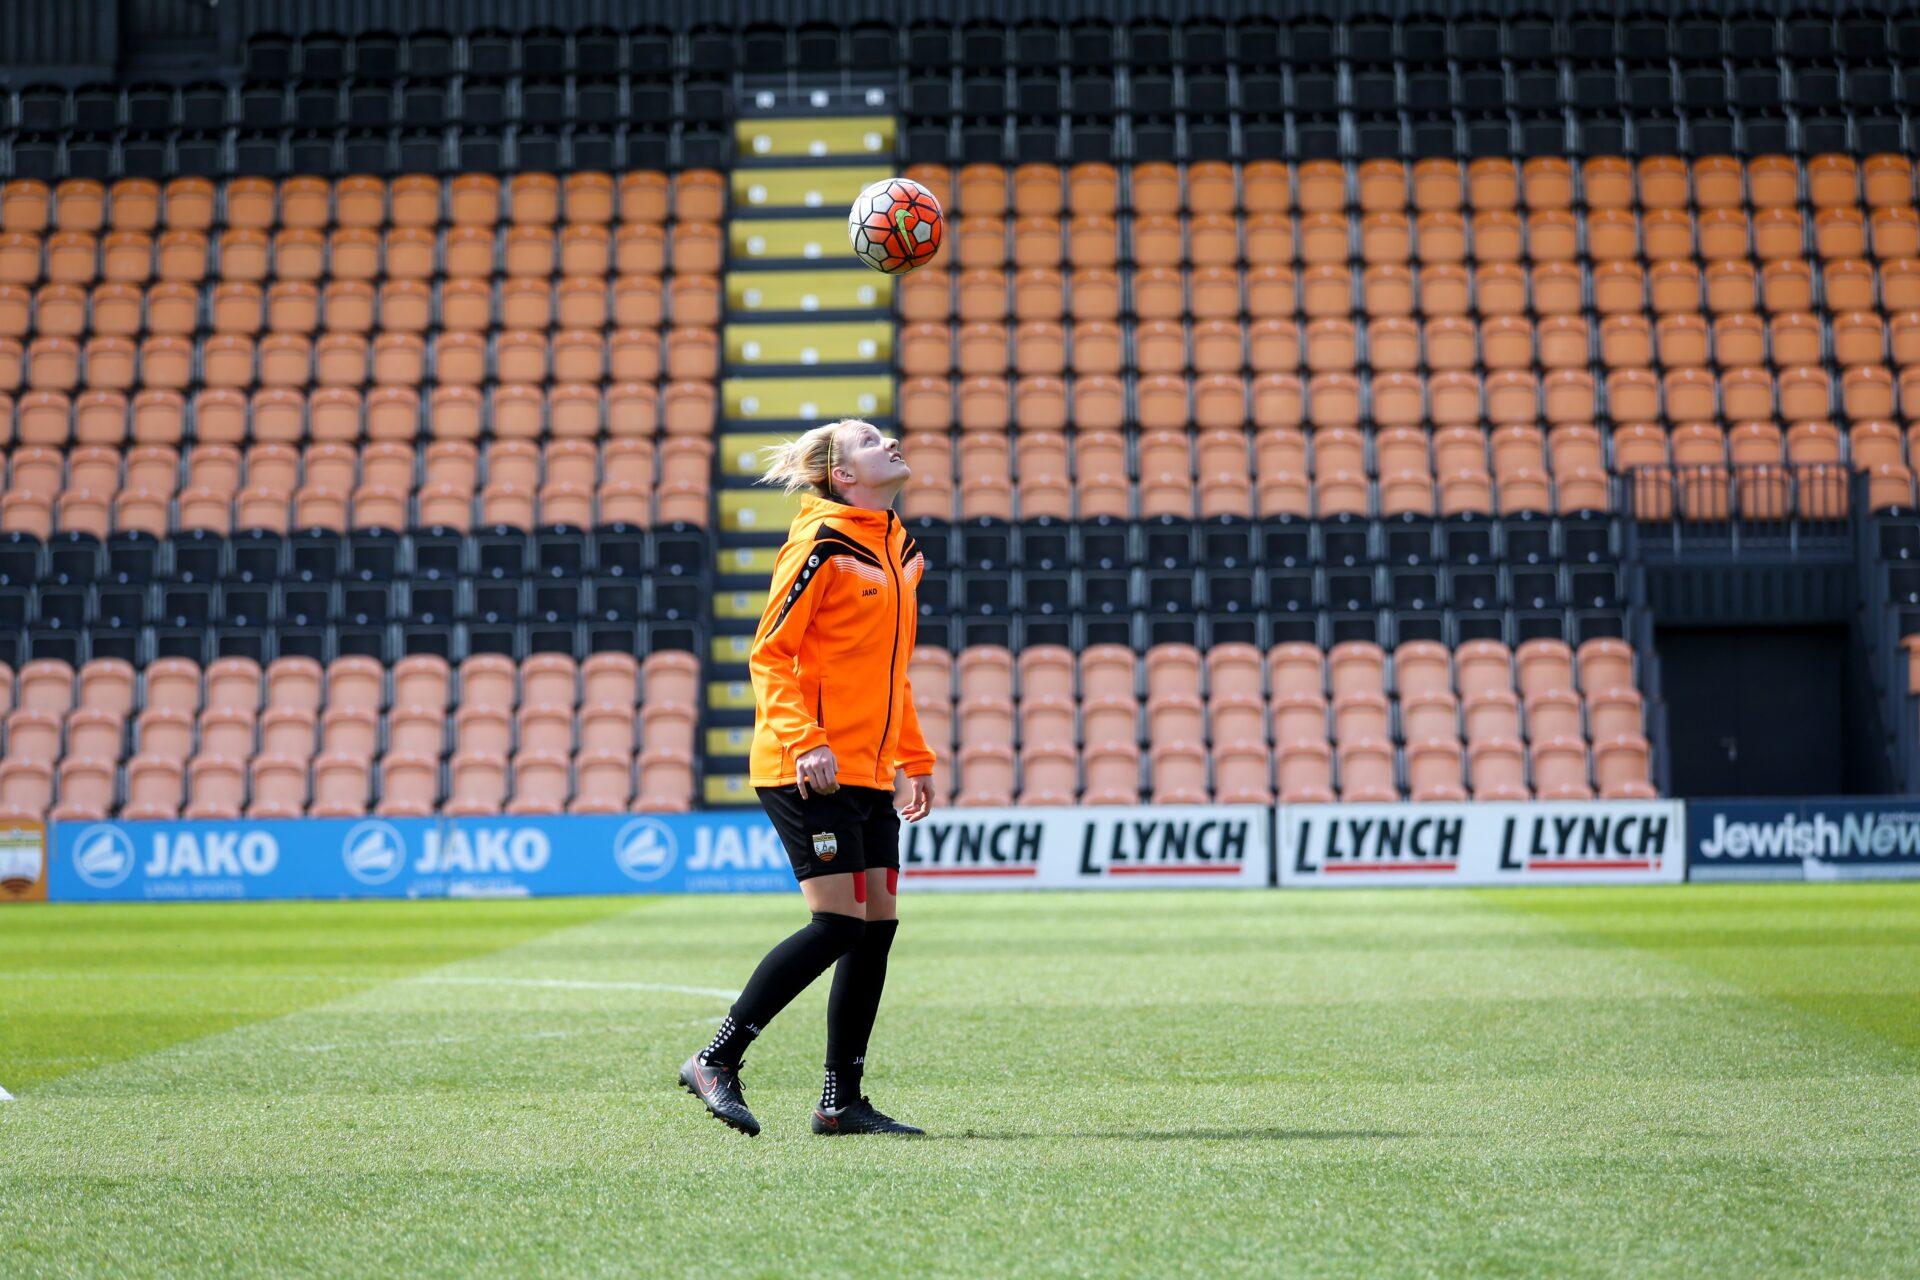 Jo Wilson heading a ball during warm-ups before a football match